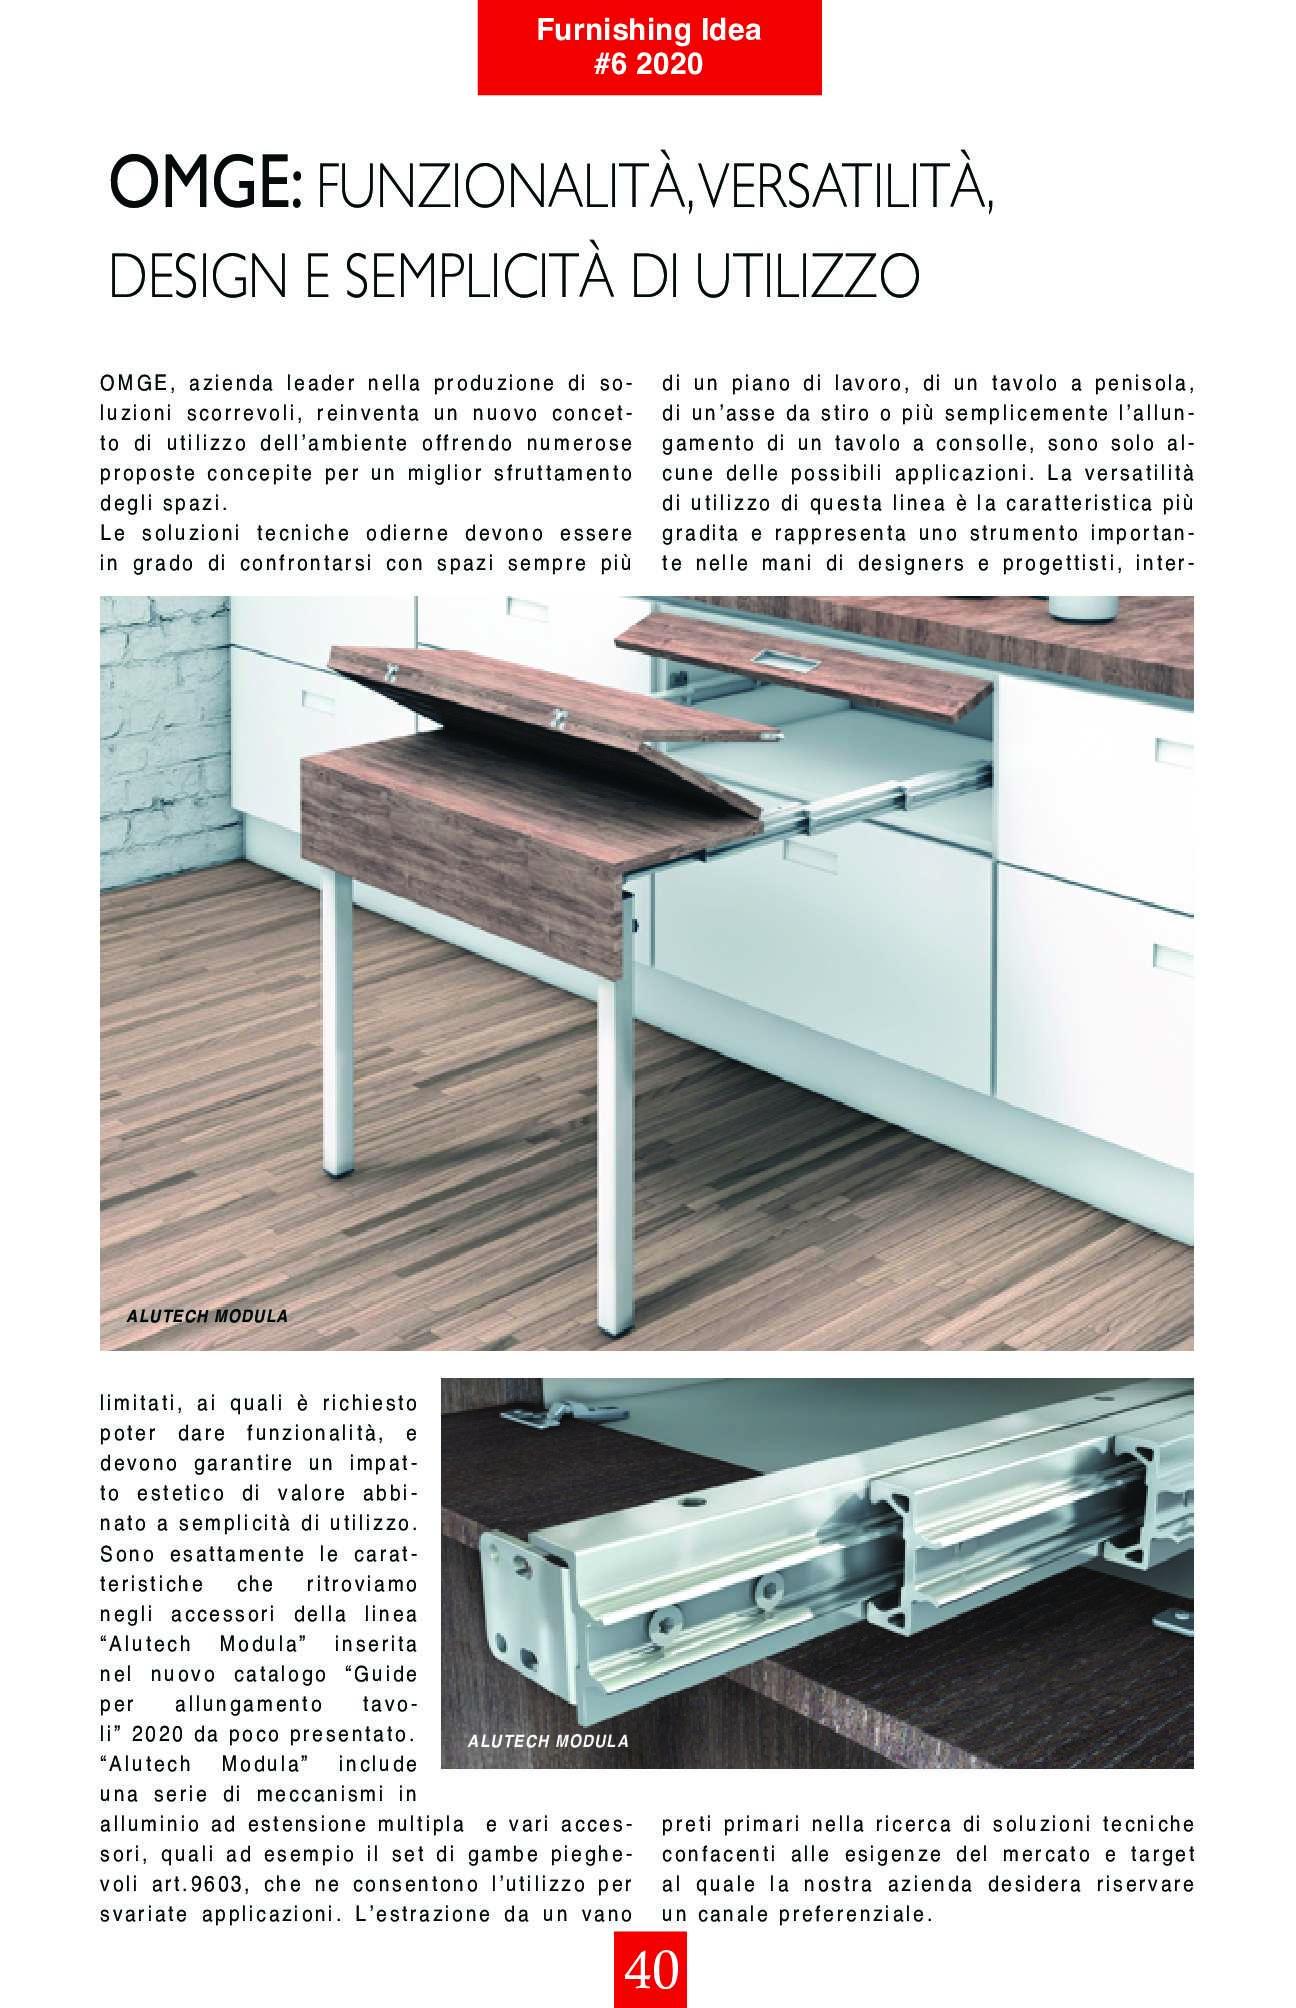 furnishingidea-6-2020_journal_22_039.jpg